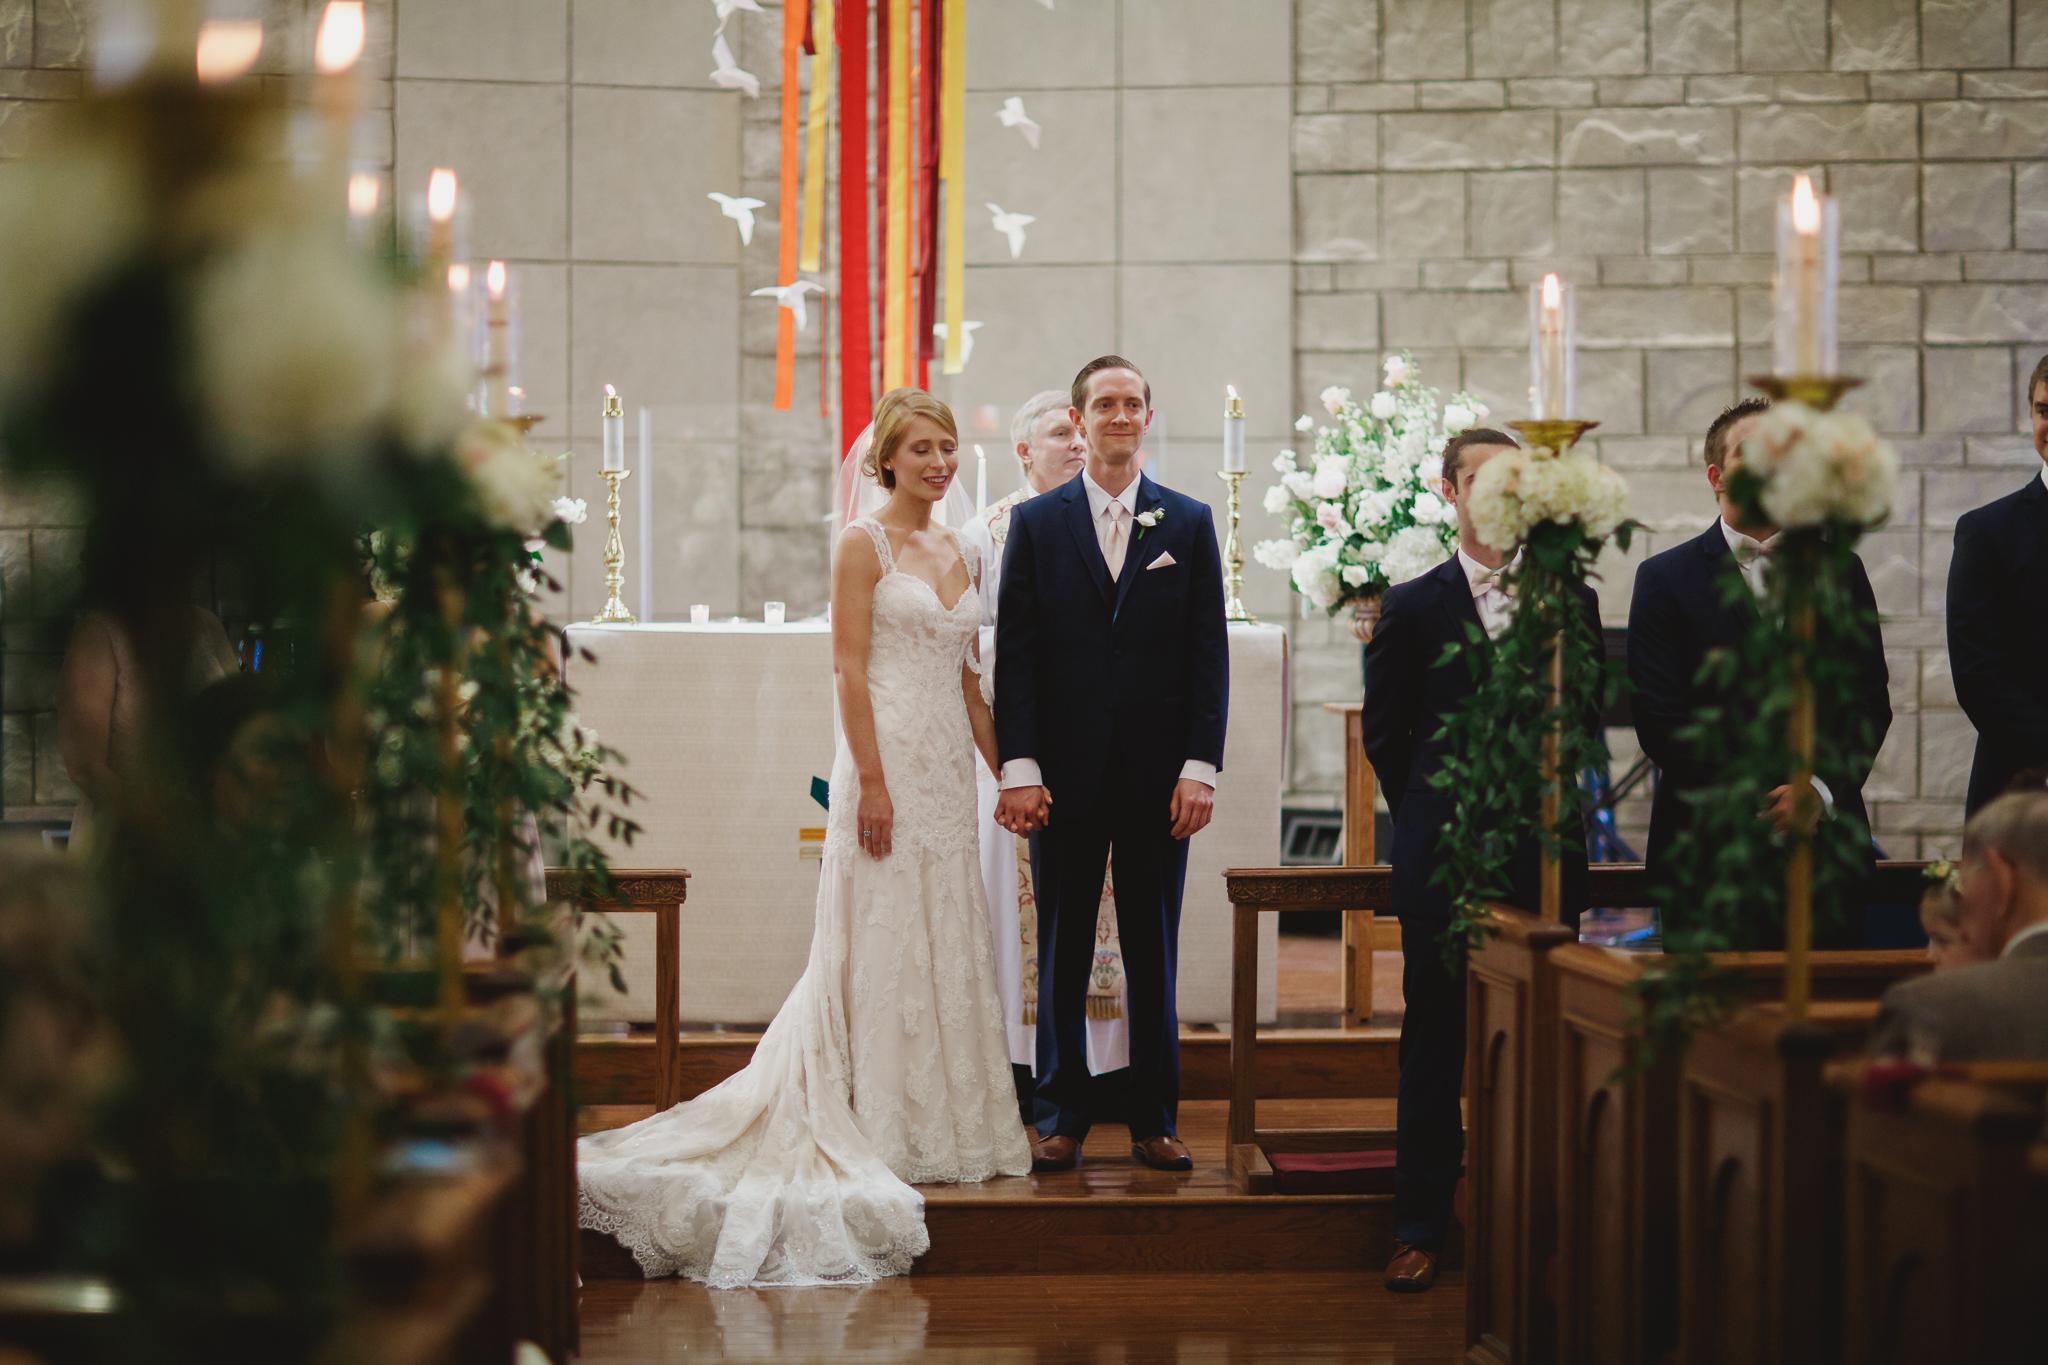 Michael and Kelly - the ashton depot - wedding DFW - wedding photographer- elizalde photography (39 of 150).jpg